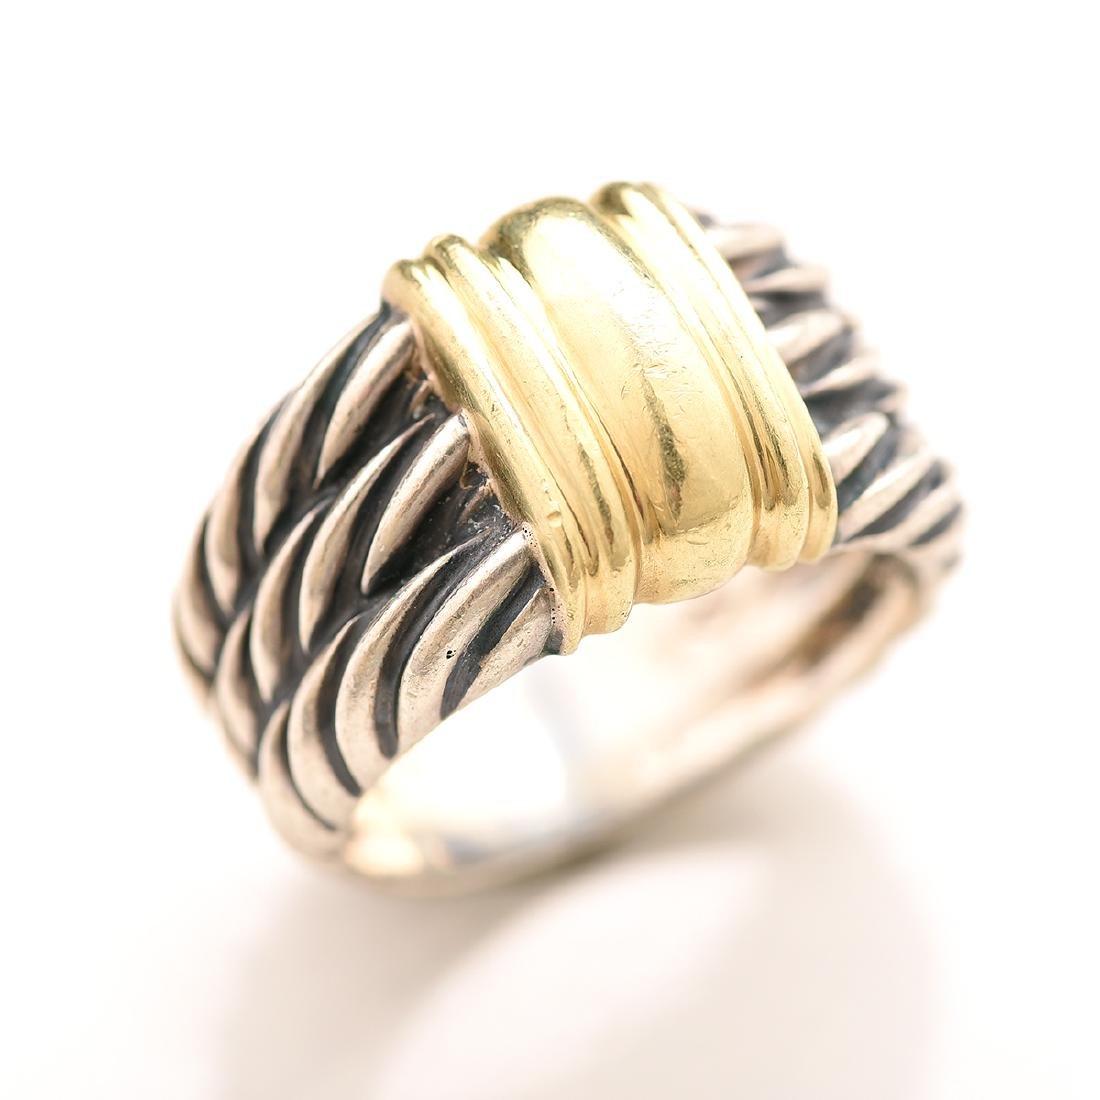 David Yurman, 14k Gold, Sterling Silver Jewelry Suite. - 2